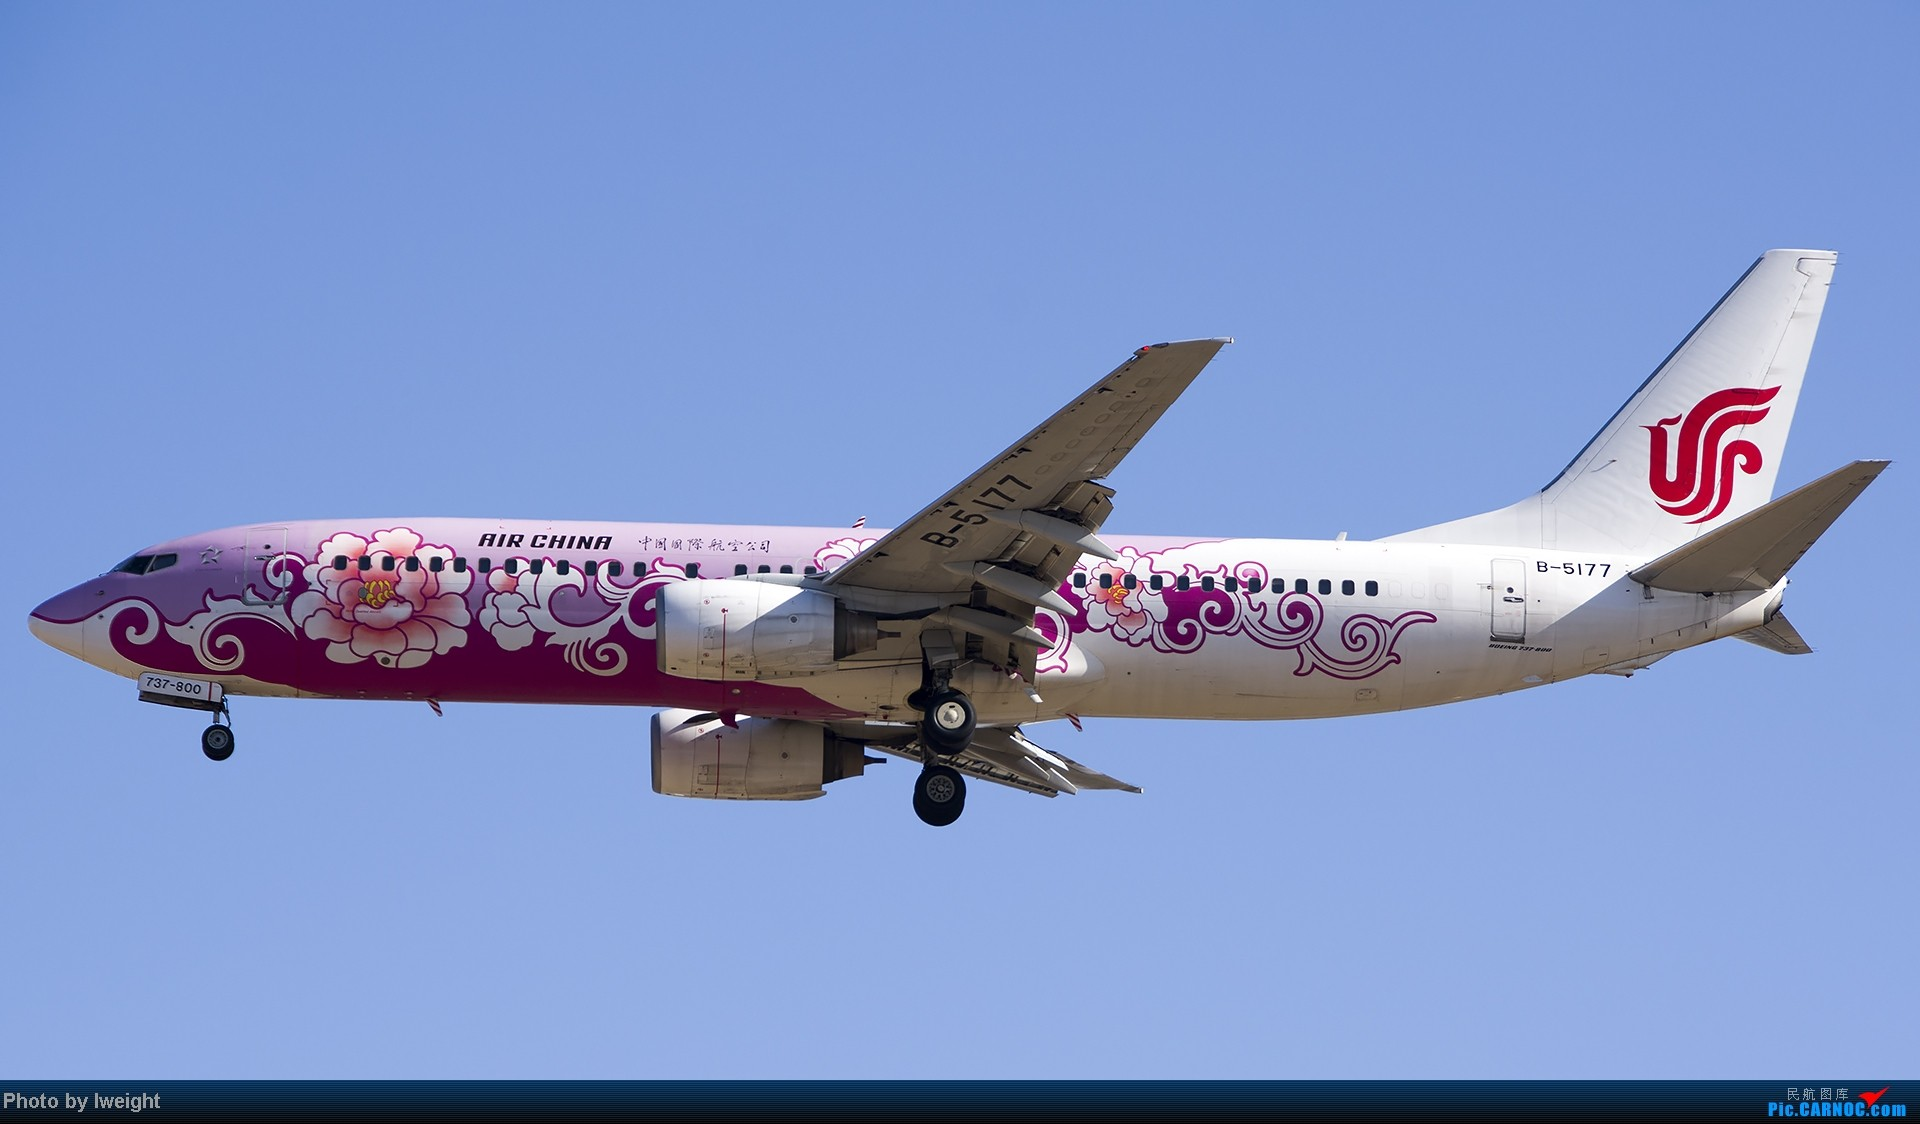 Re:[原创]抓住APEC蓝的尾巴,再拍上一组 BOEING 737-800 B-5177 中国北京首都机场